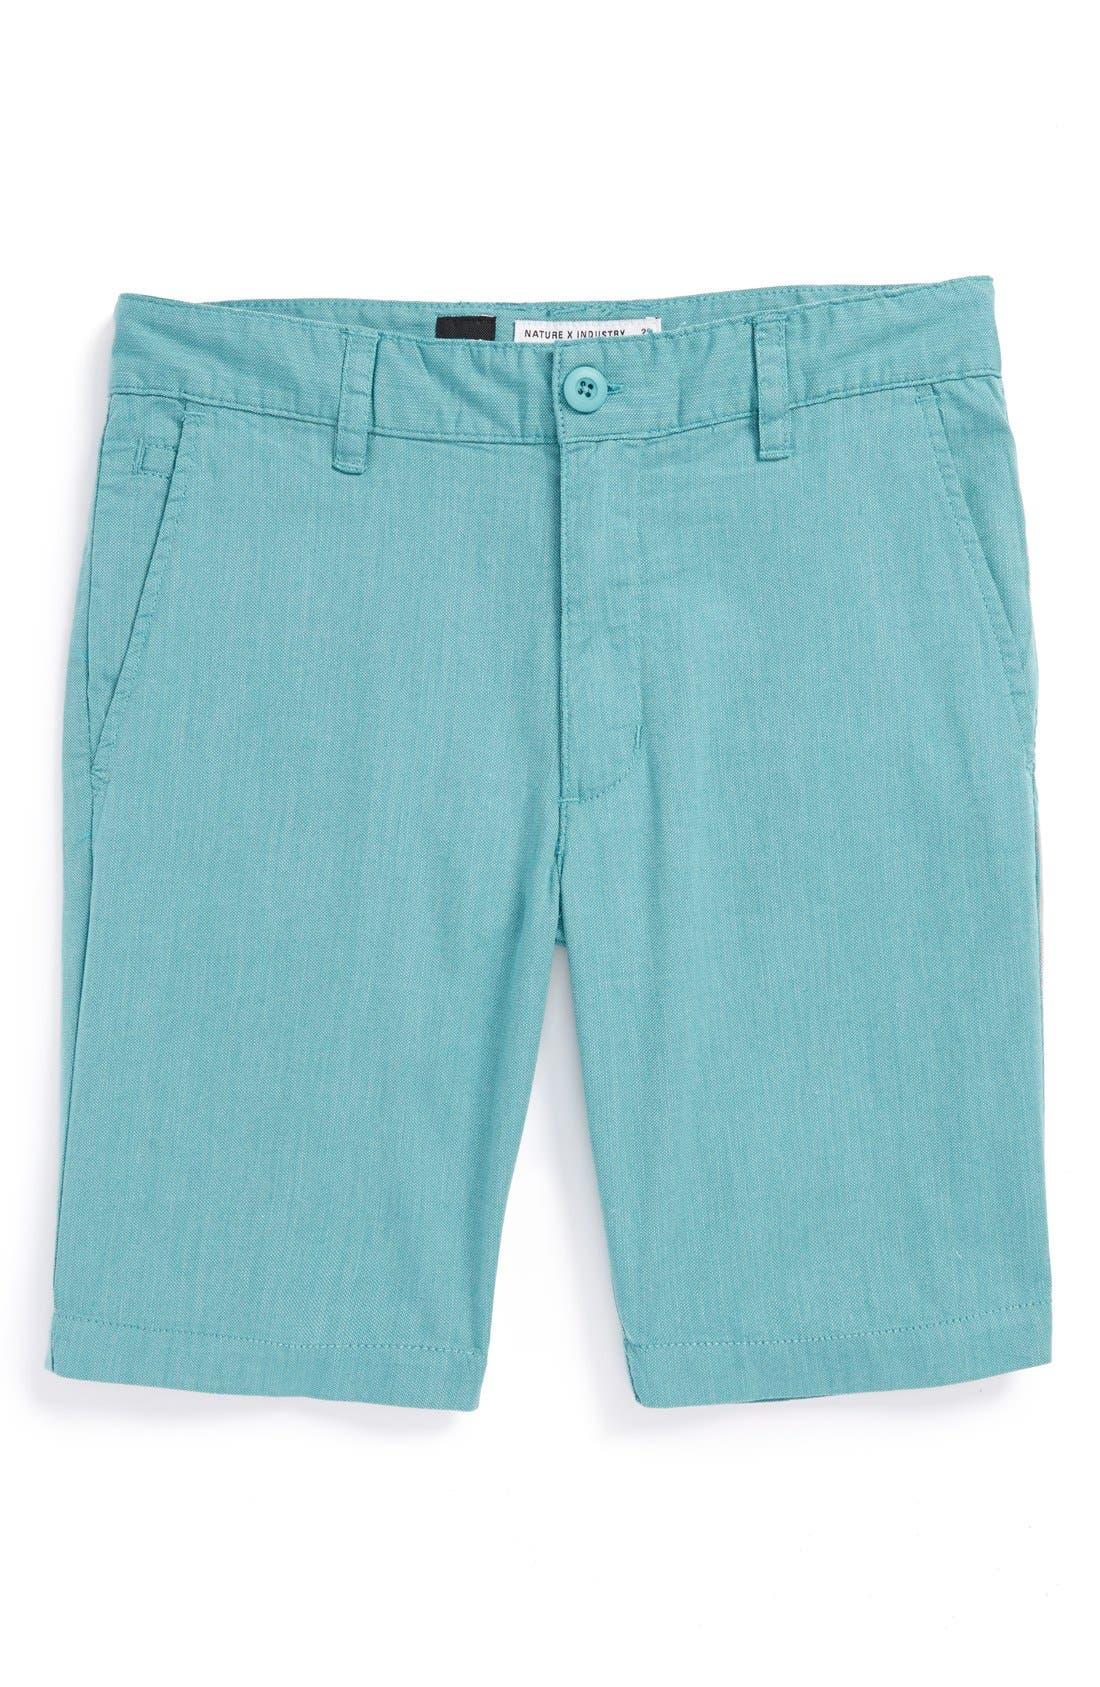 Main Image - RVCA 'Fracture' Shorts (Big Boys)